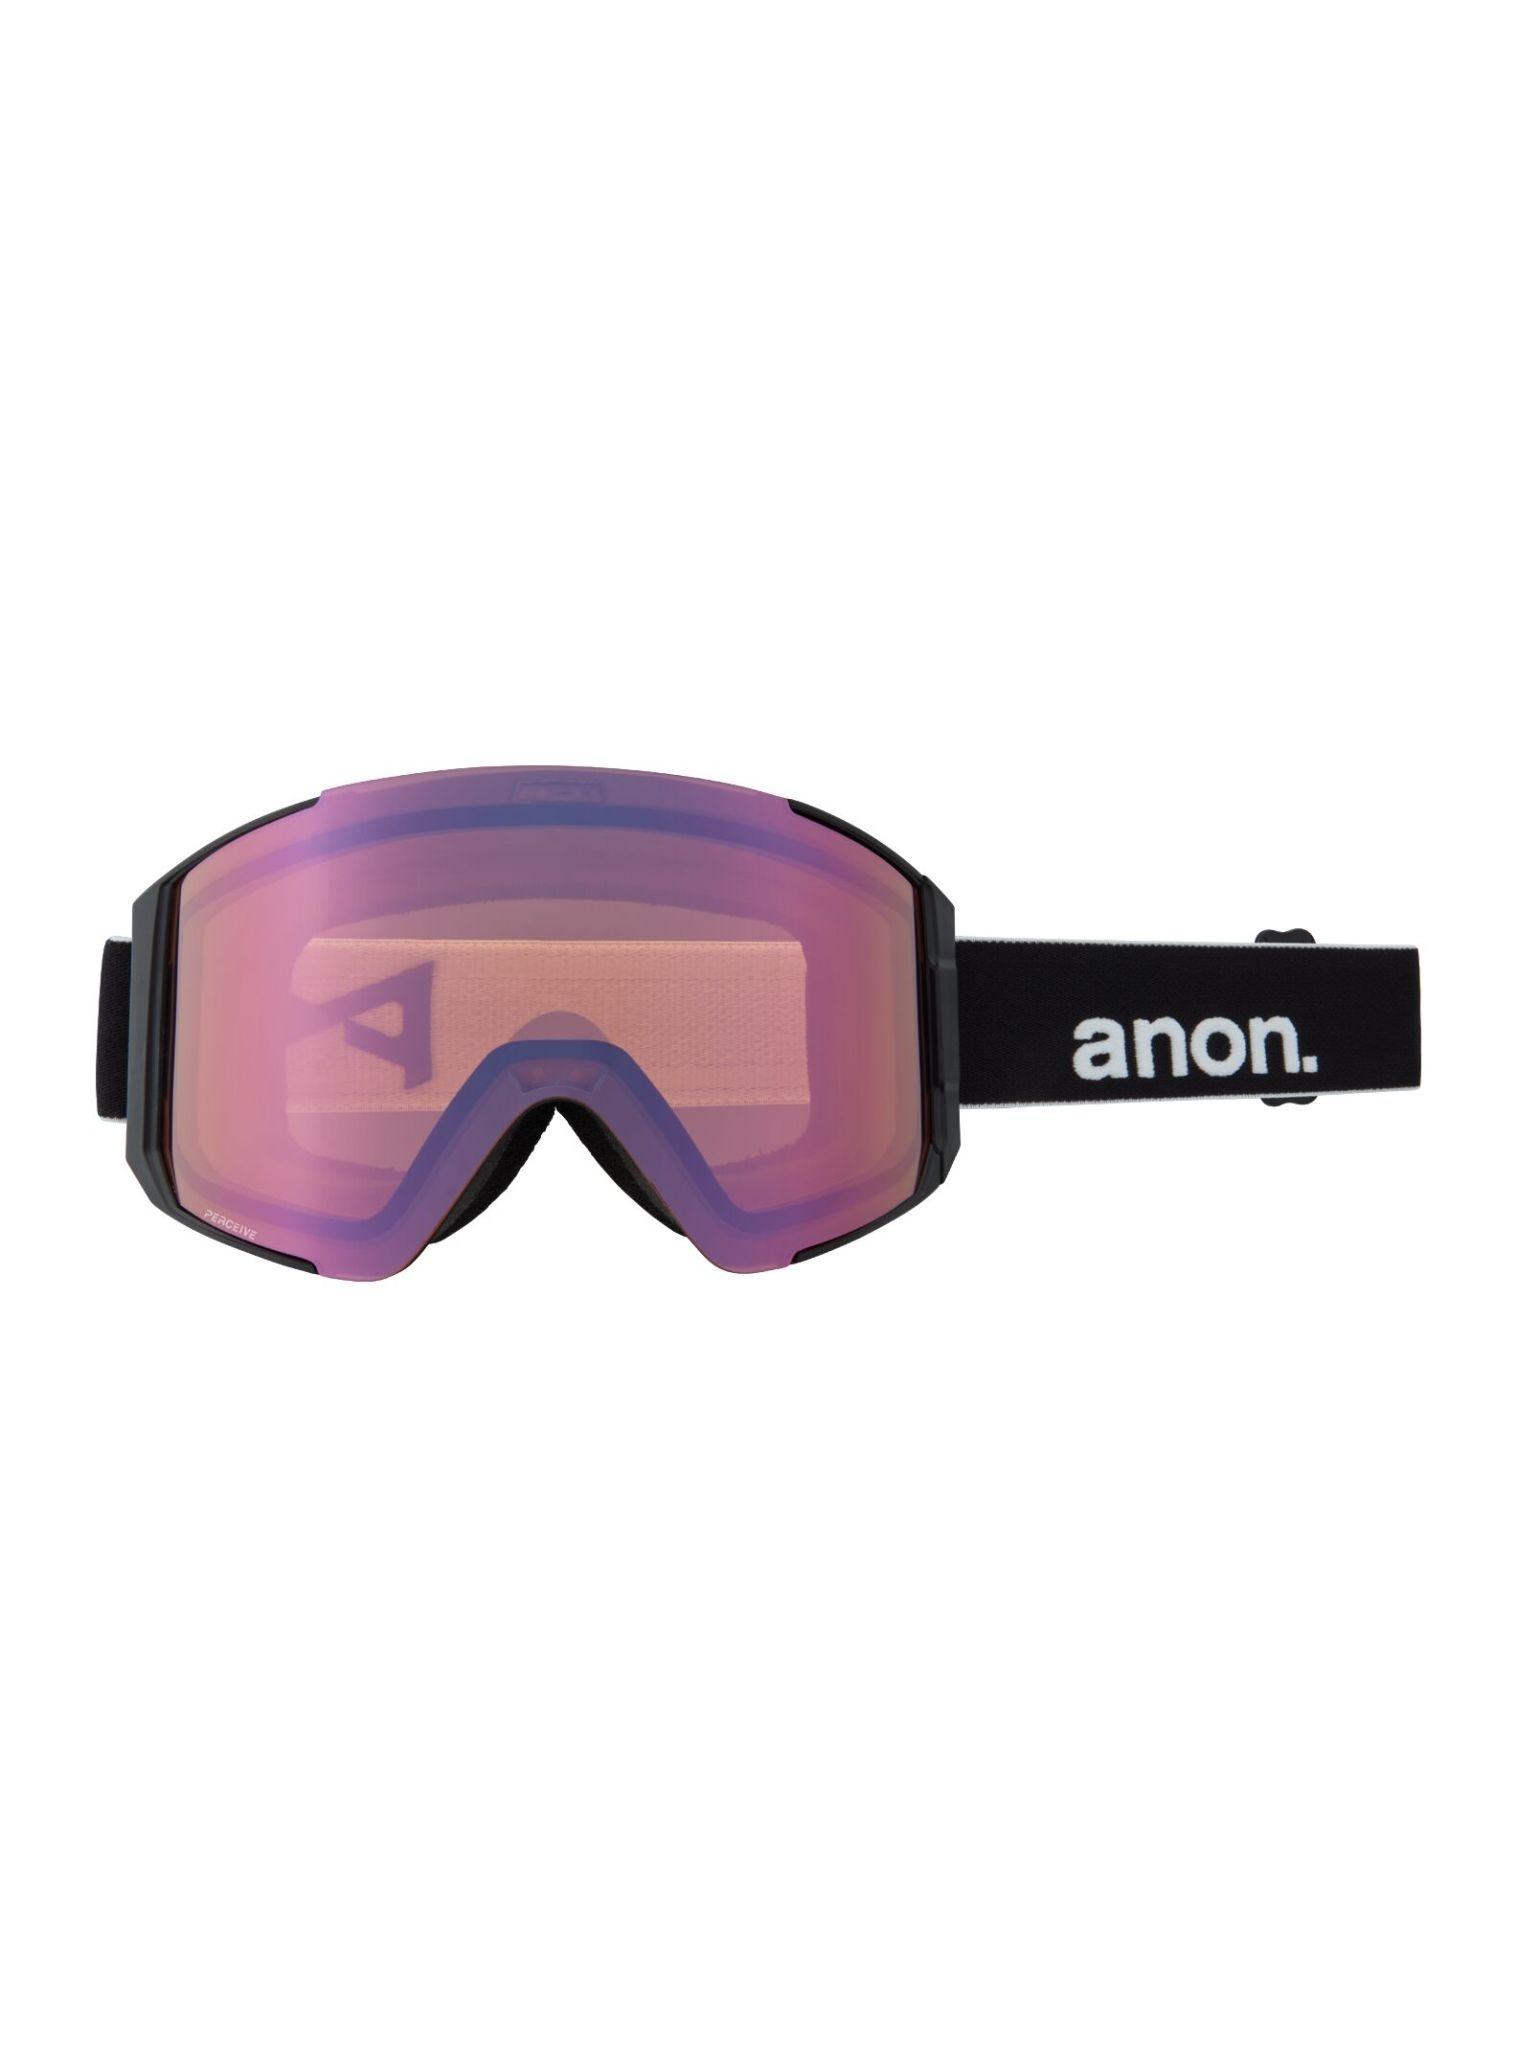 Anon. Anon Women's Sync Goggle + Bonus Lens